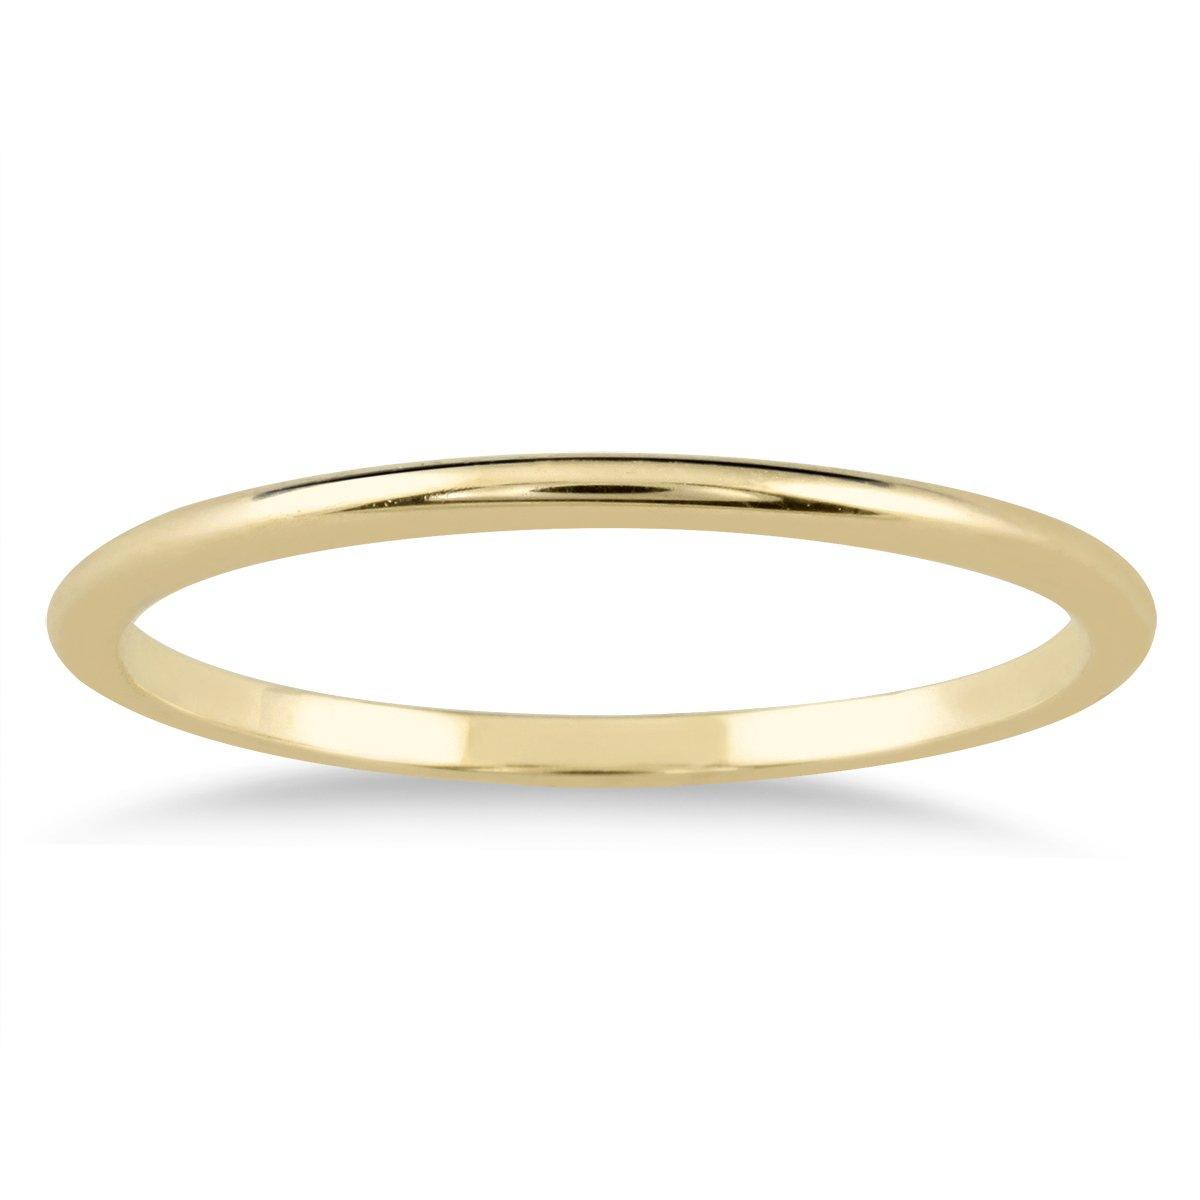 8873ef7a03cc11 Amazon.com: 1mm Thin Domed Wedding Band in 14K Yellow Gold: SZUL: Jewelry